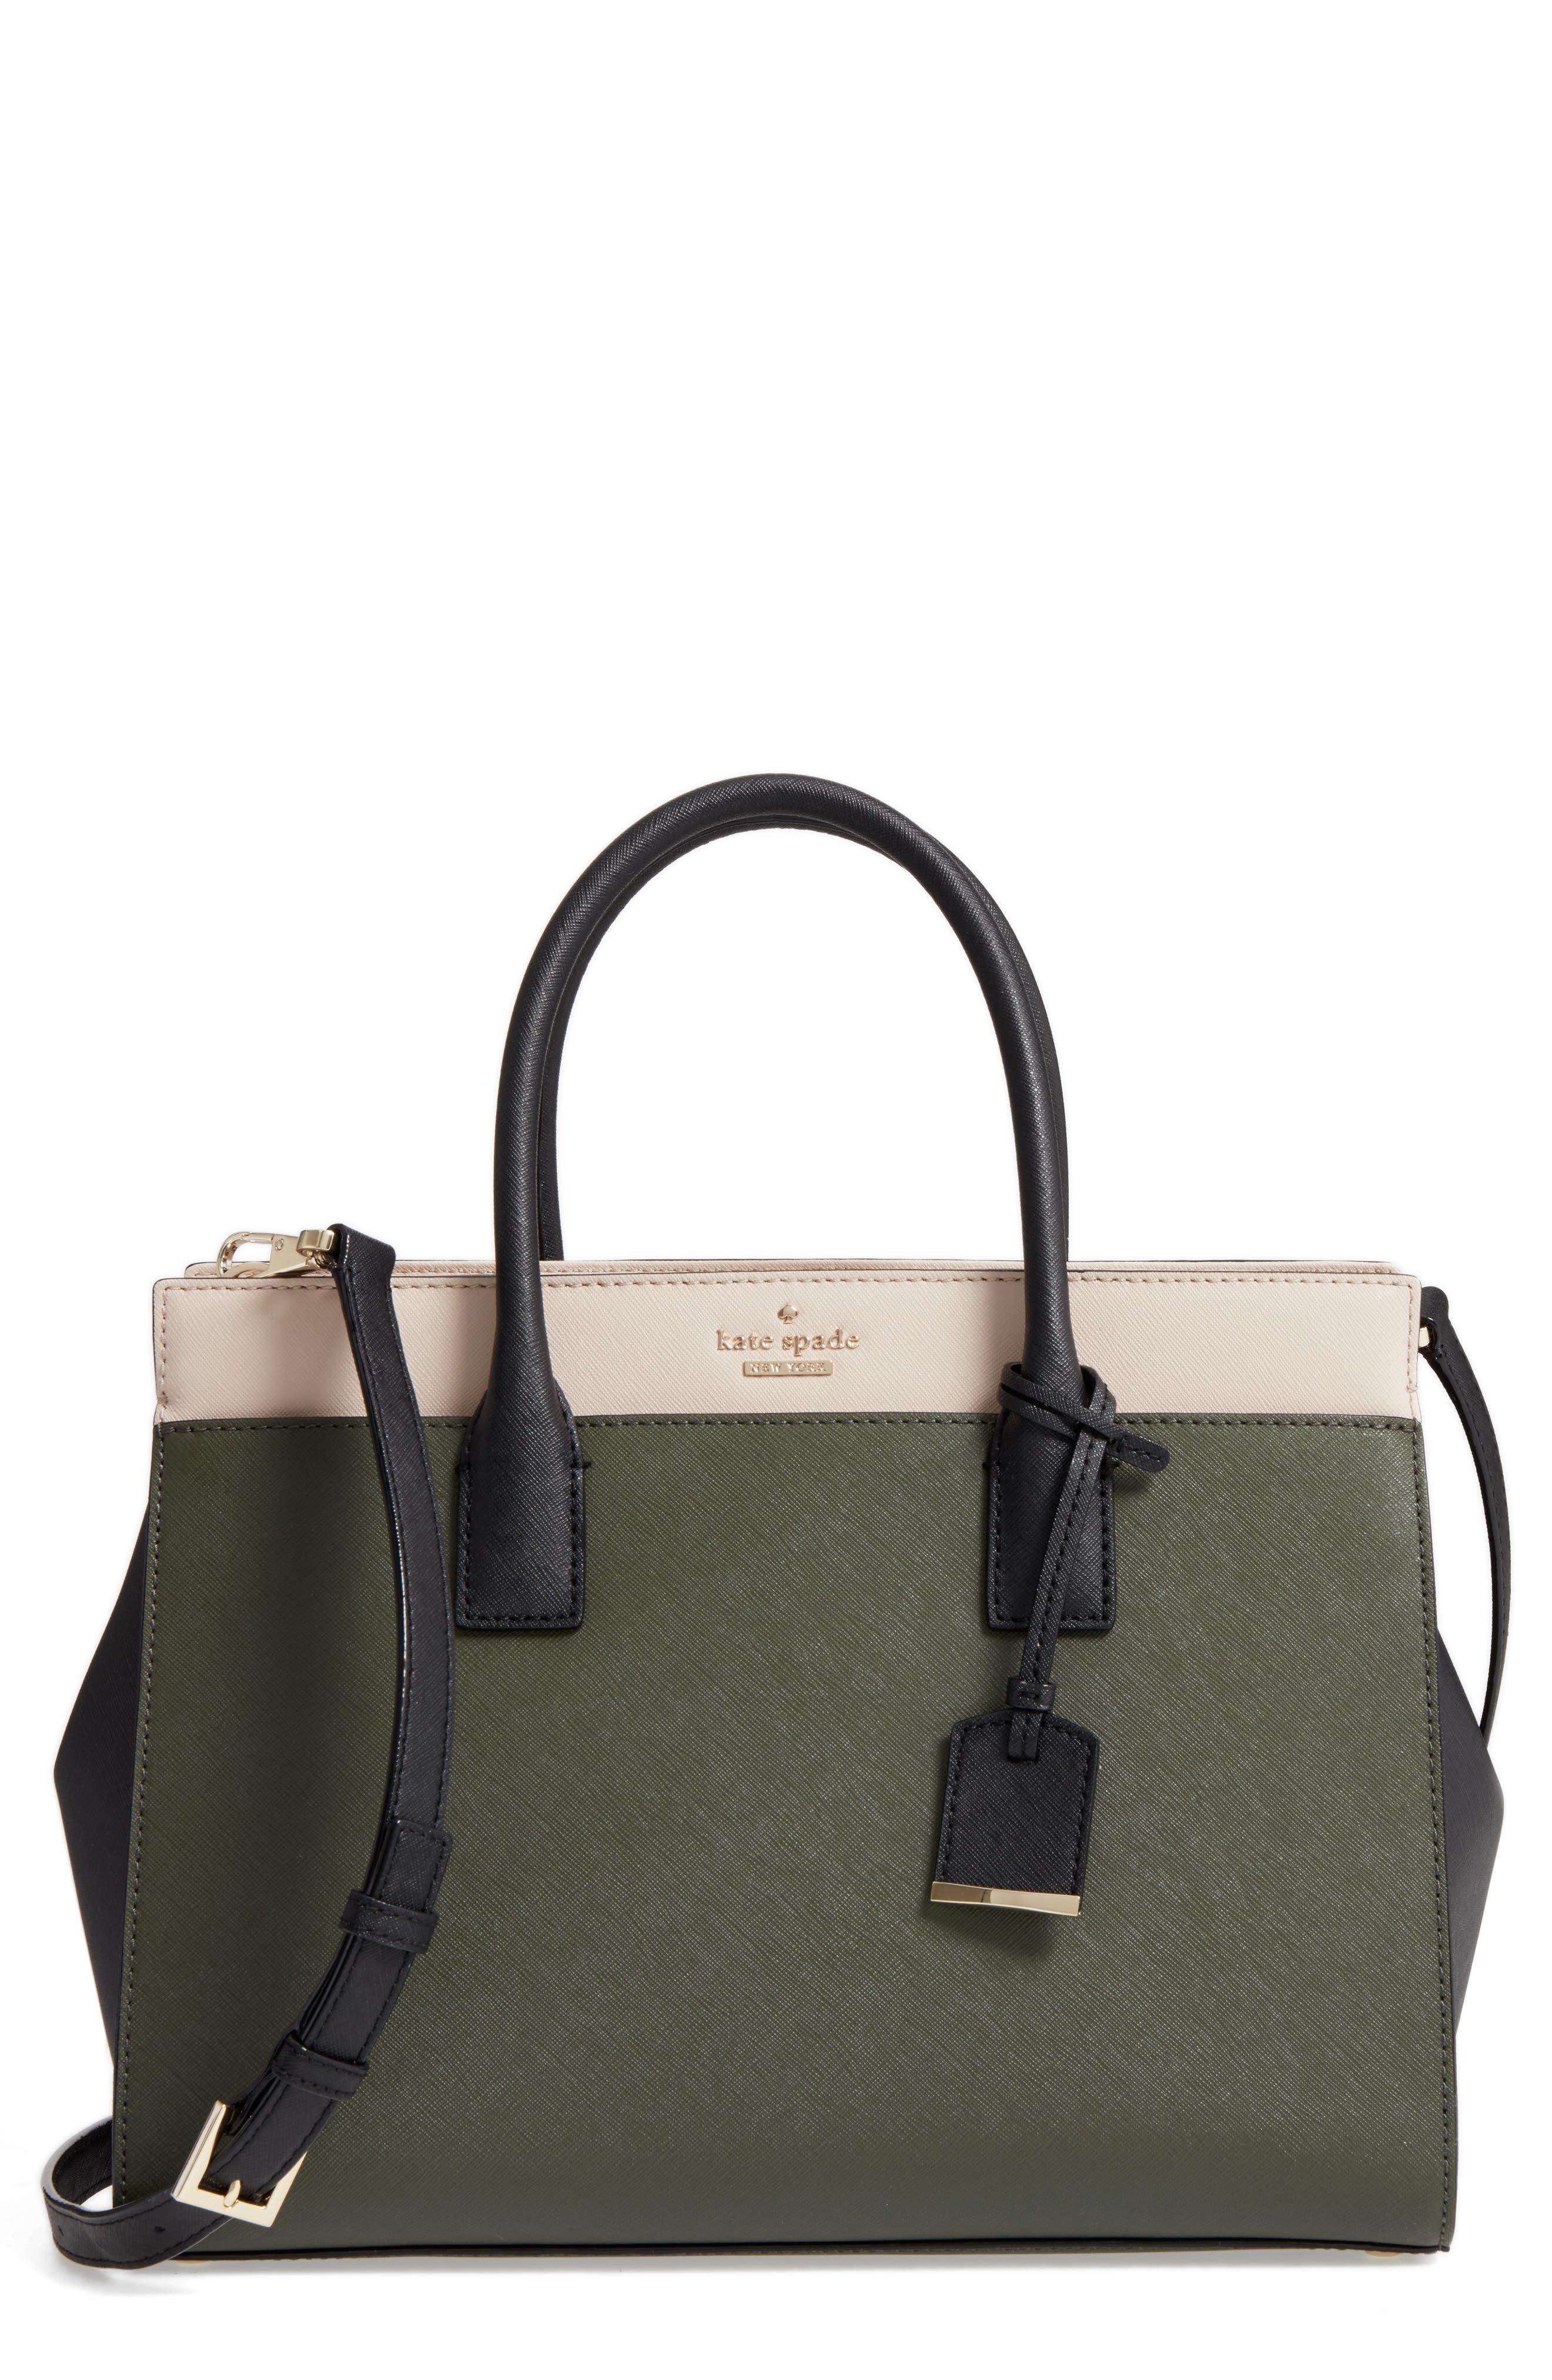 Main Image - kate spade new york cameron street - candace leather satchel